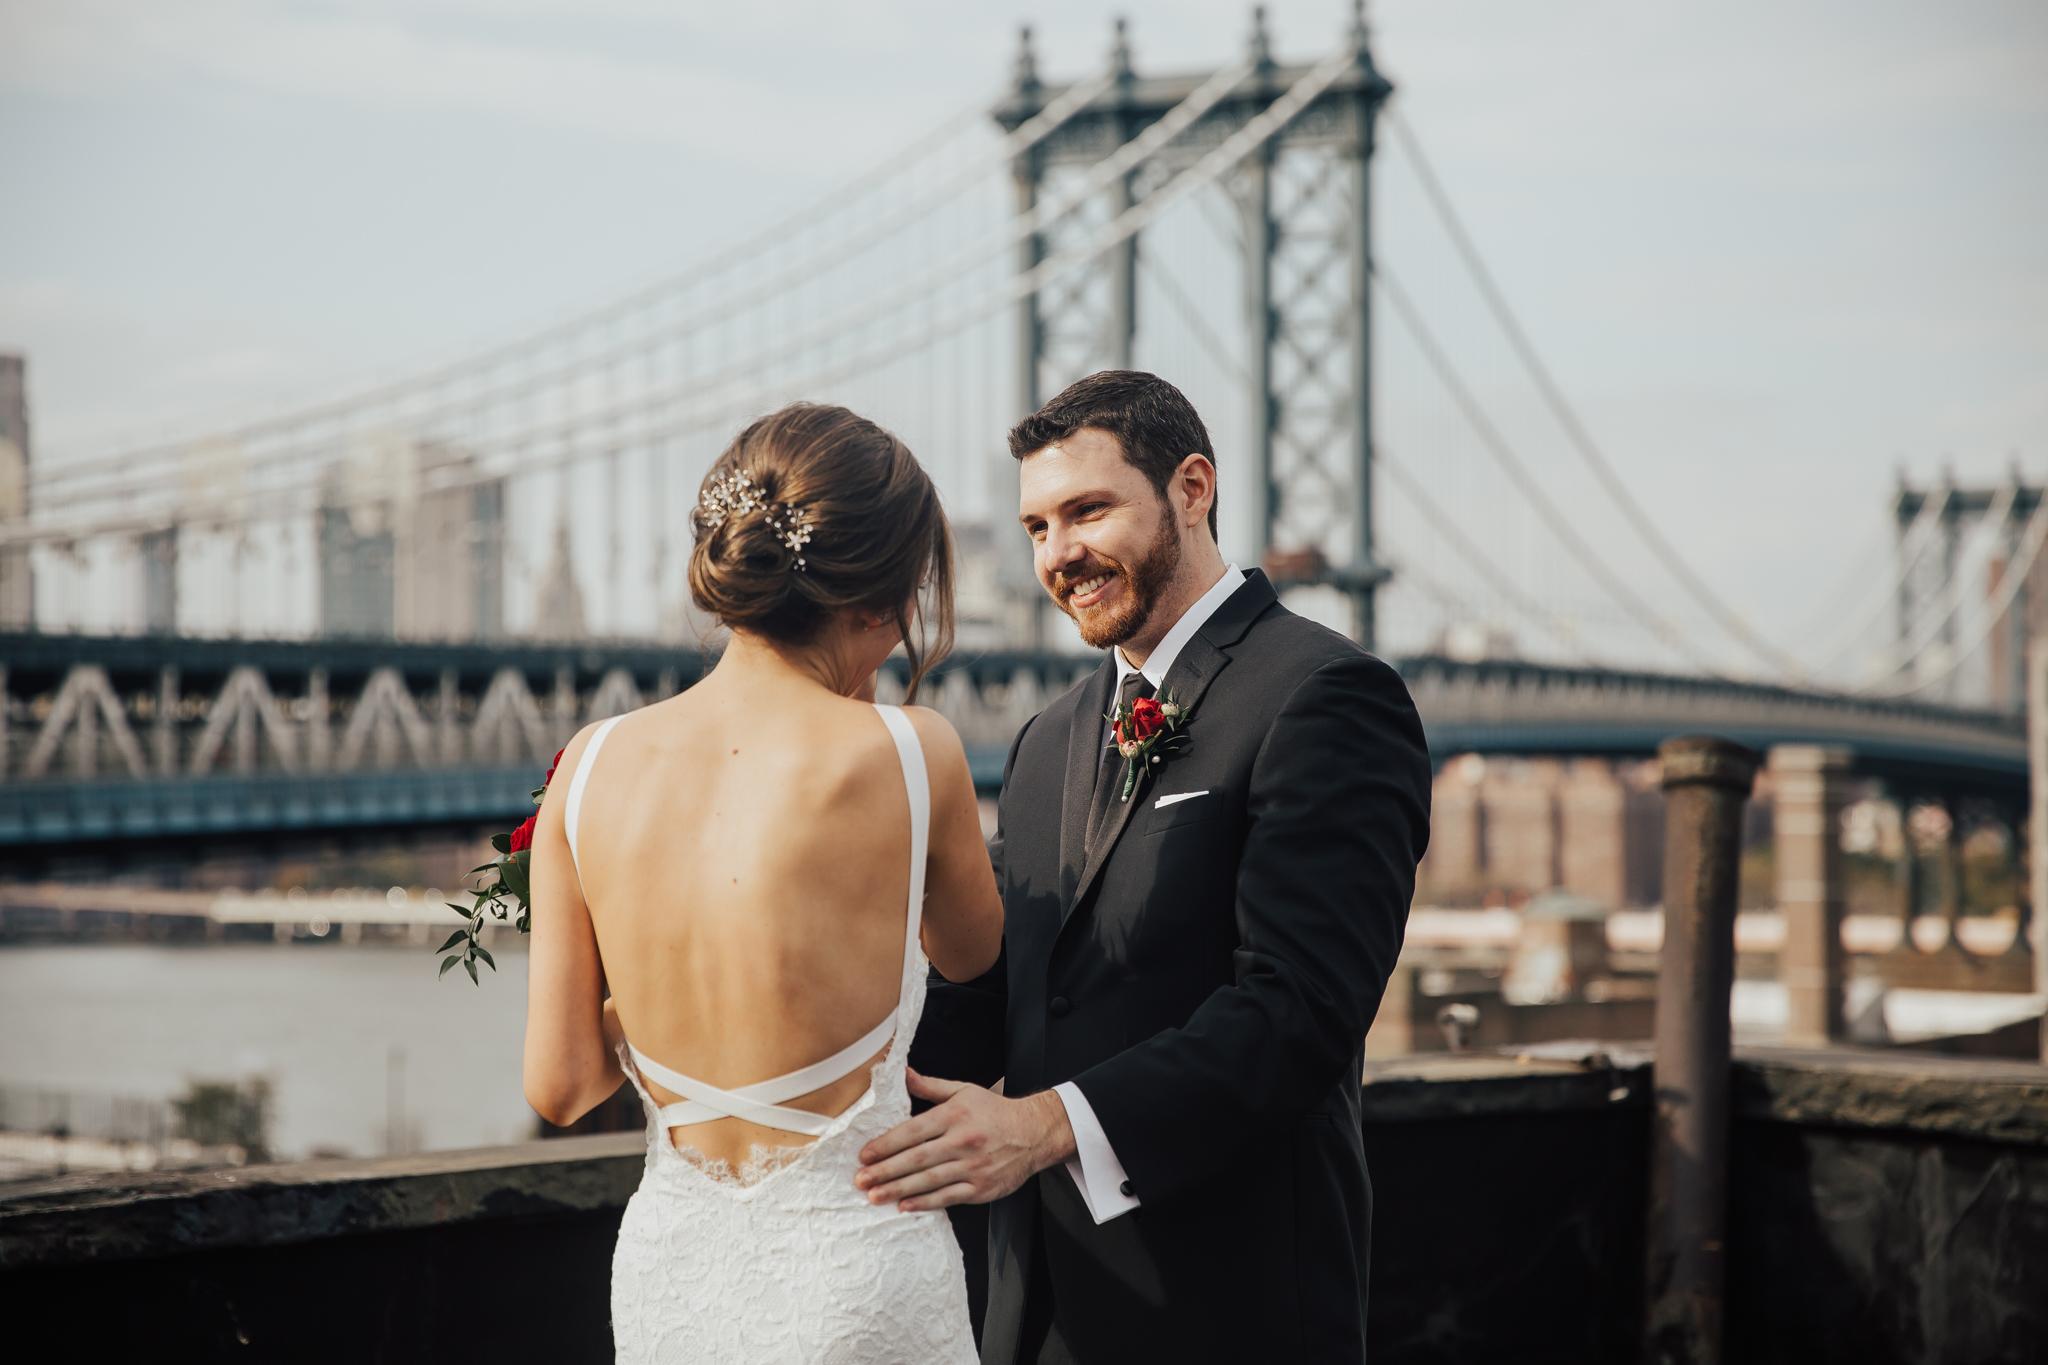 26-bridge-wedding-brooklyn-008.JPG